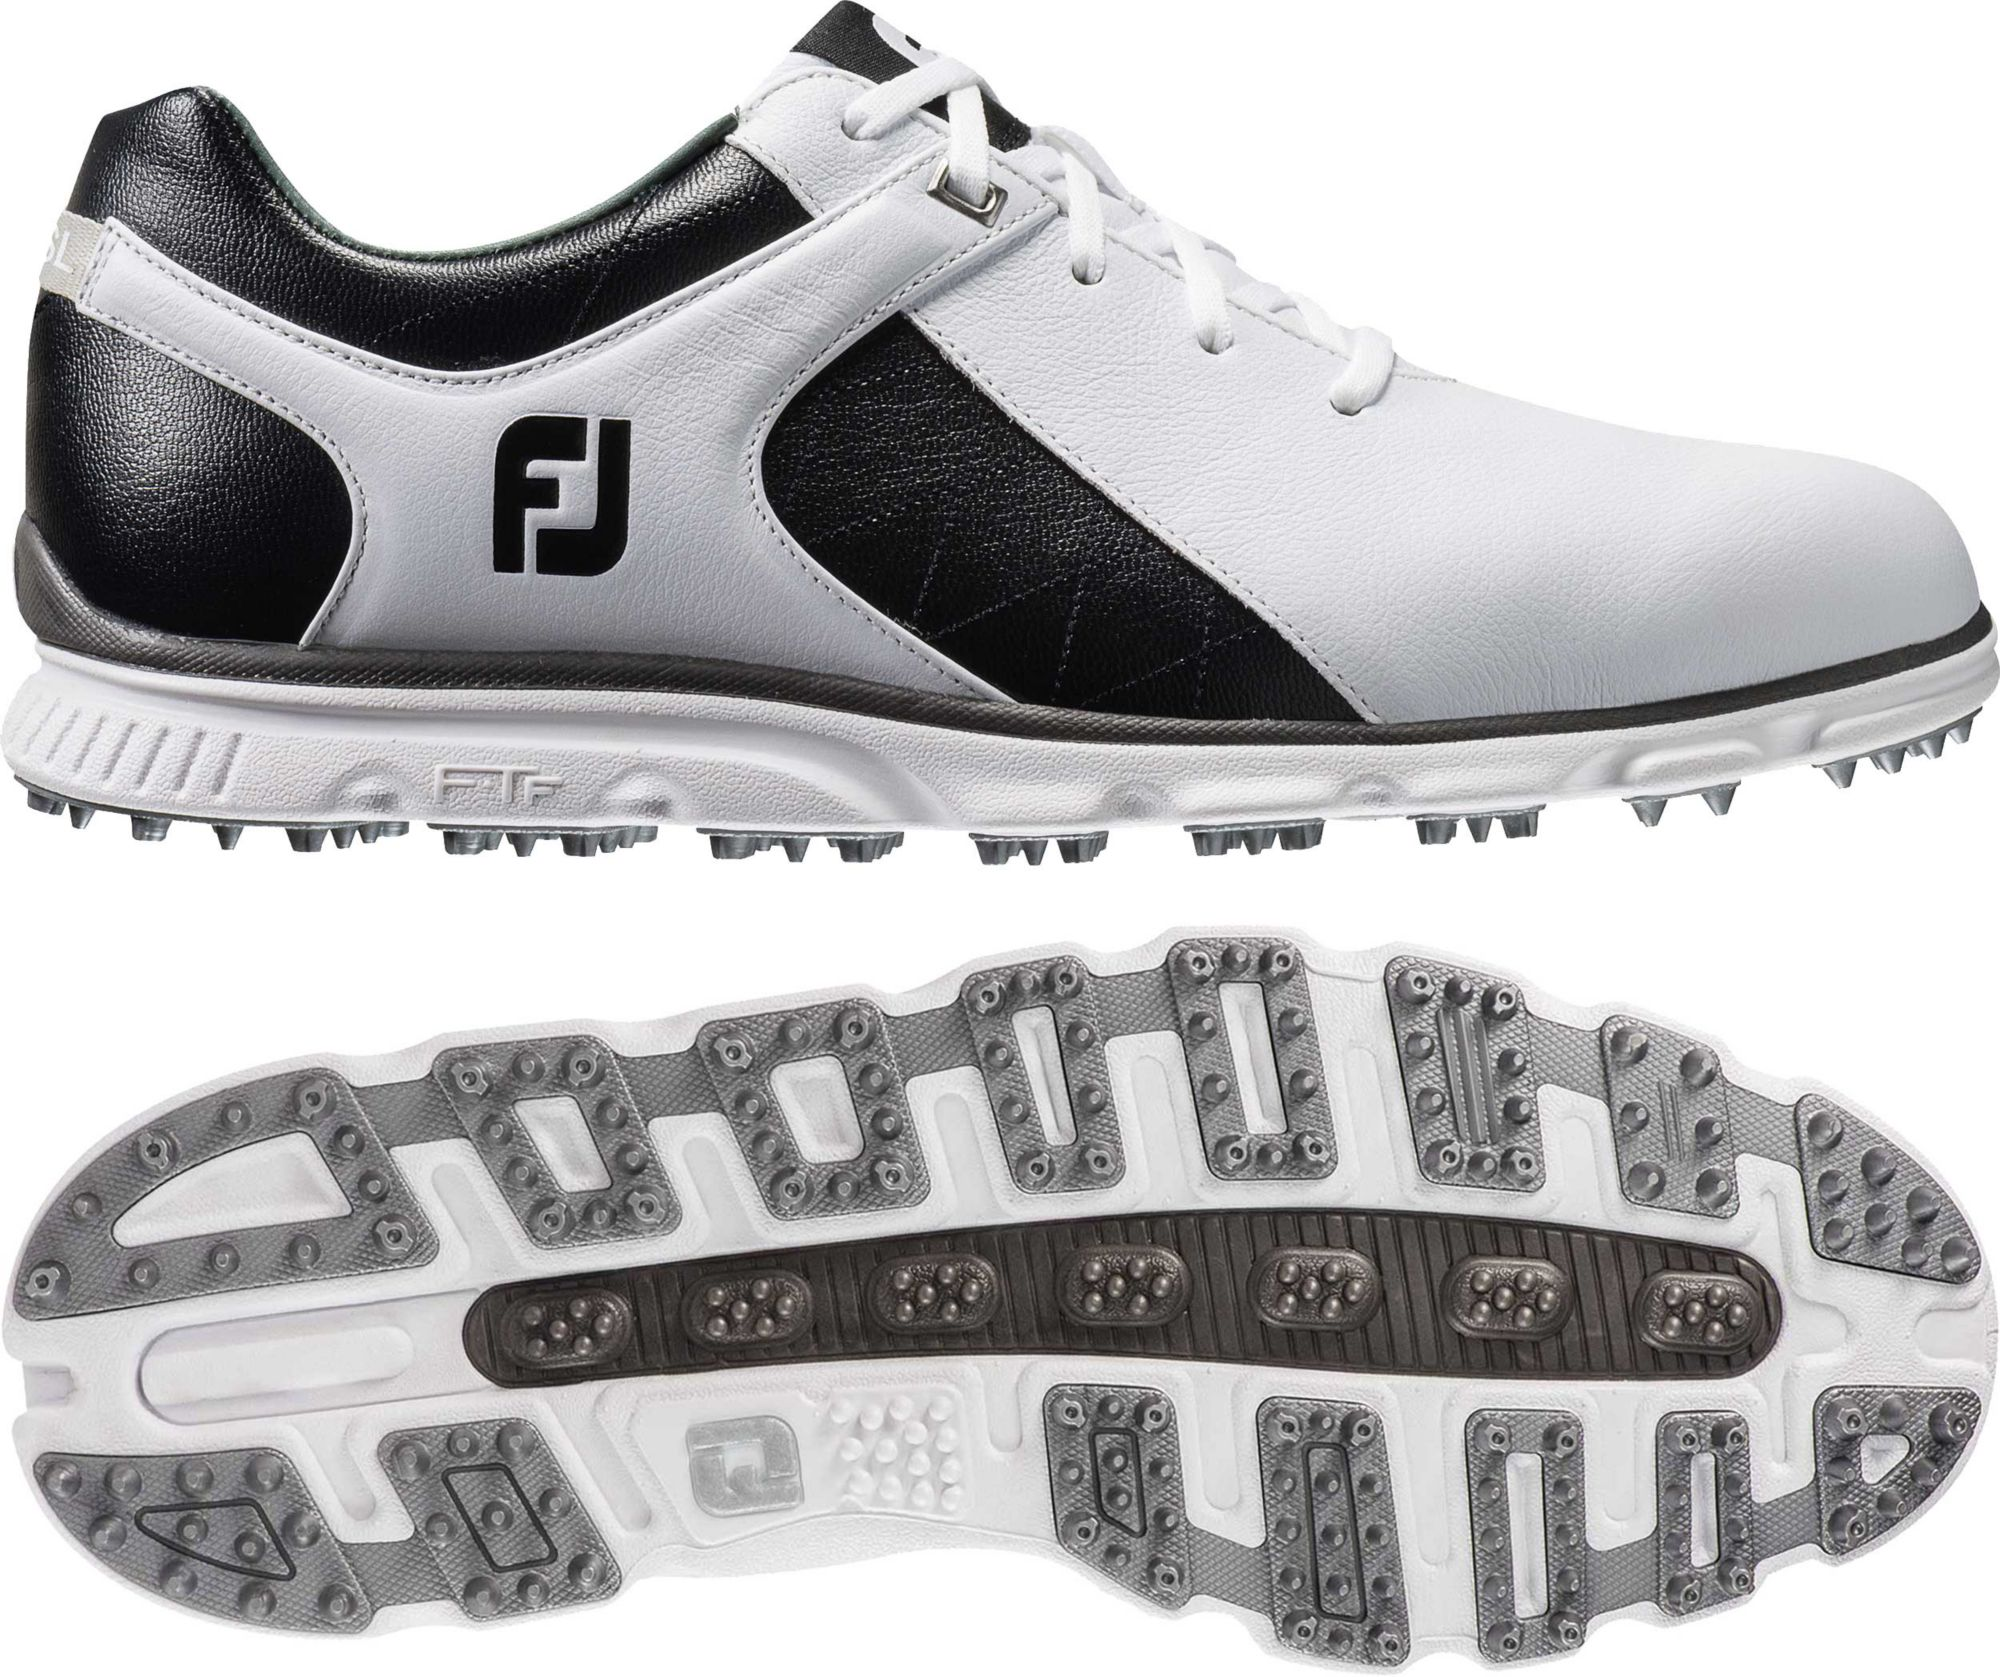 FootJoy Men s Pro SL Golf Shoes (Previous Season Style)  f9da70a63d8